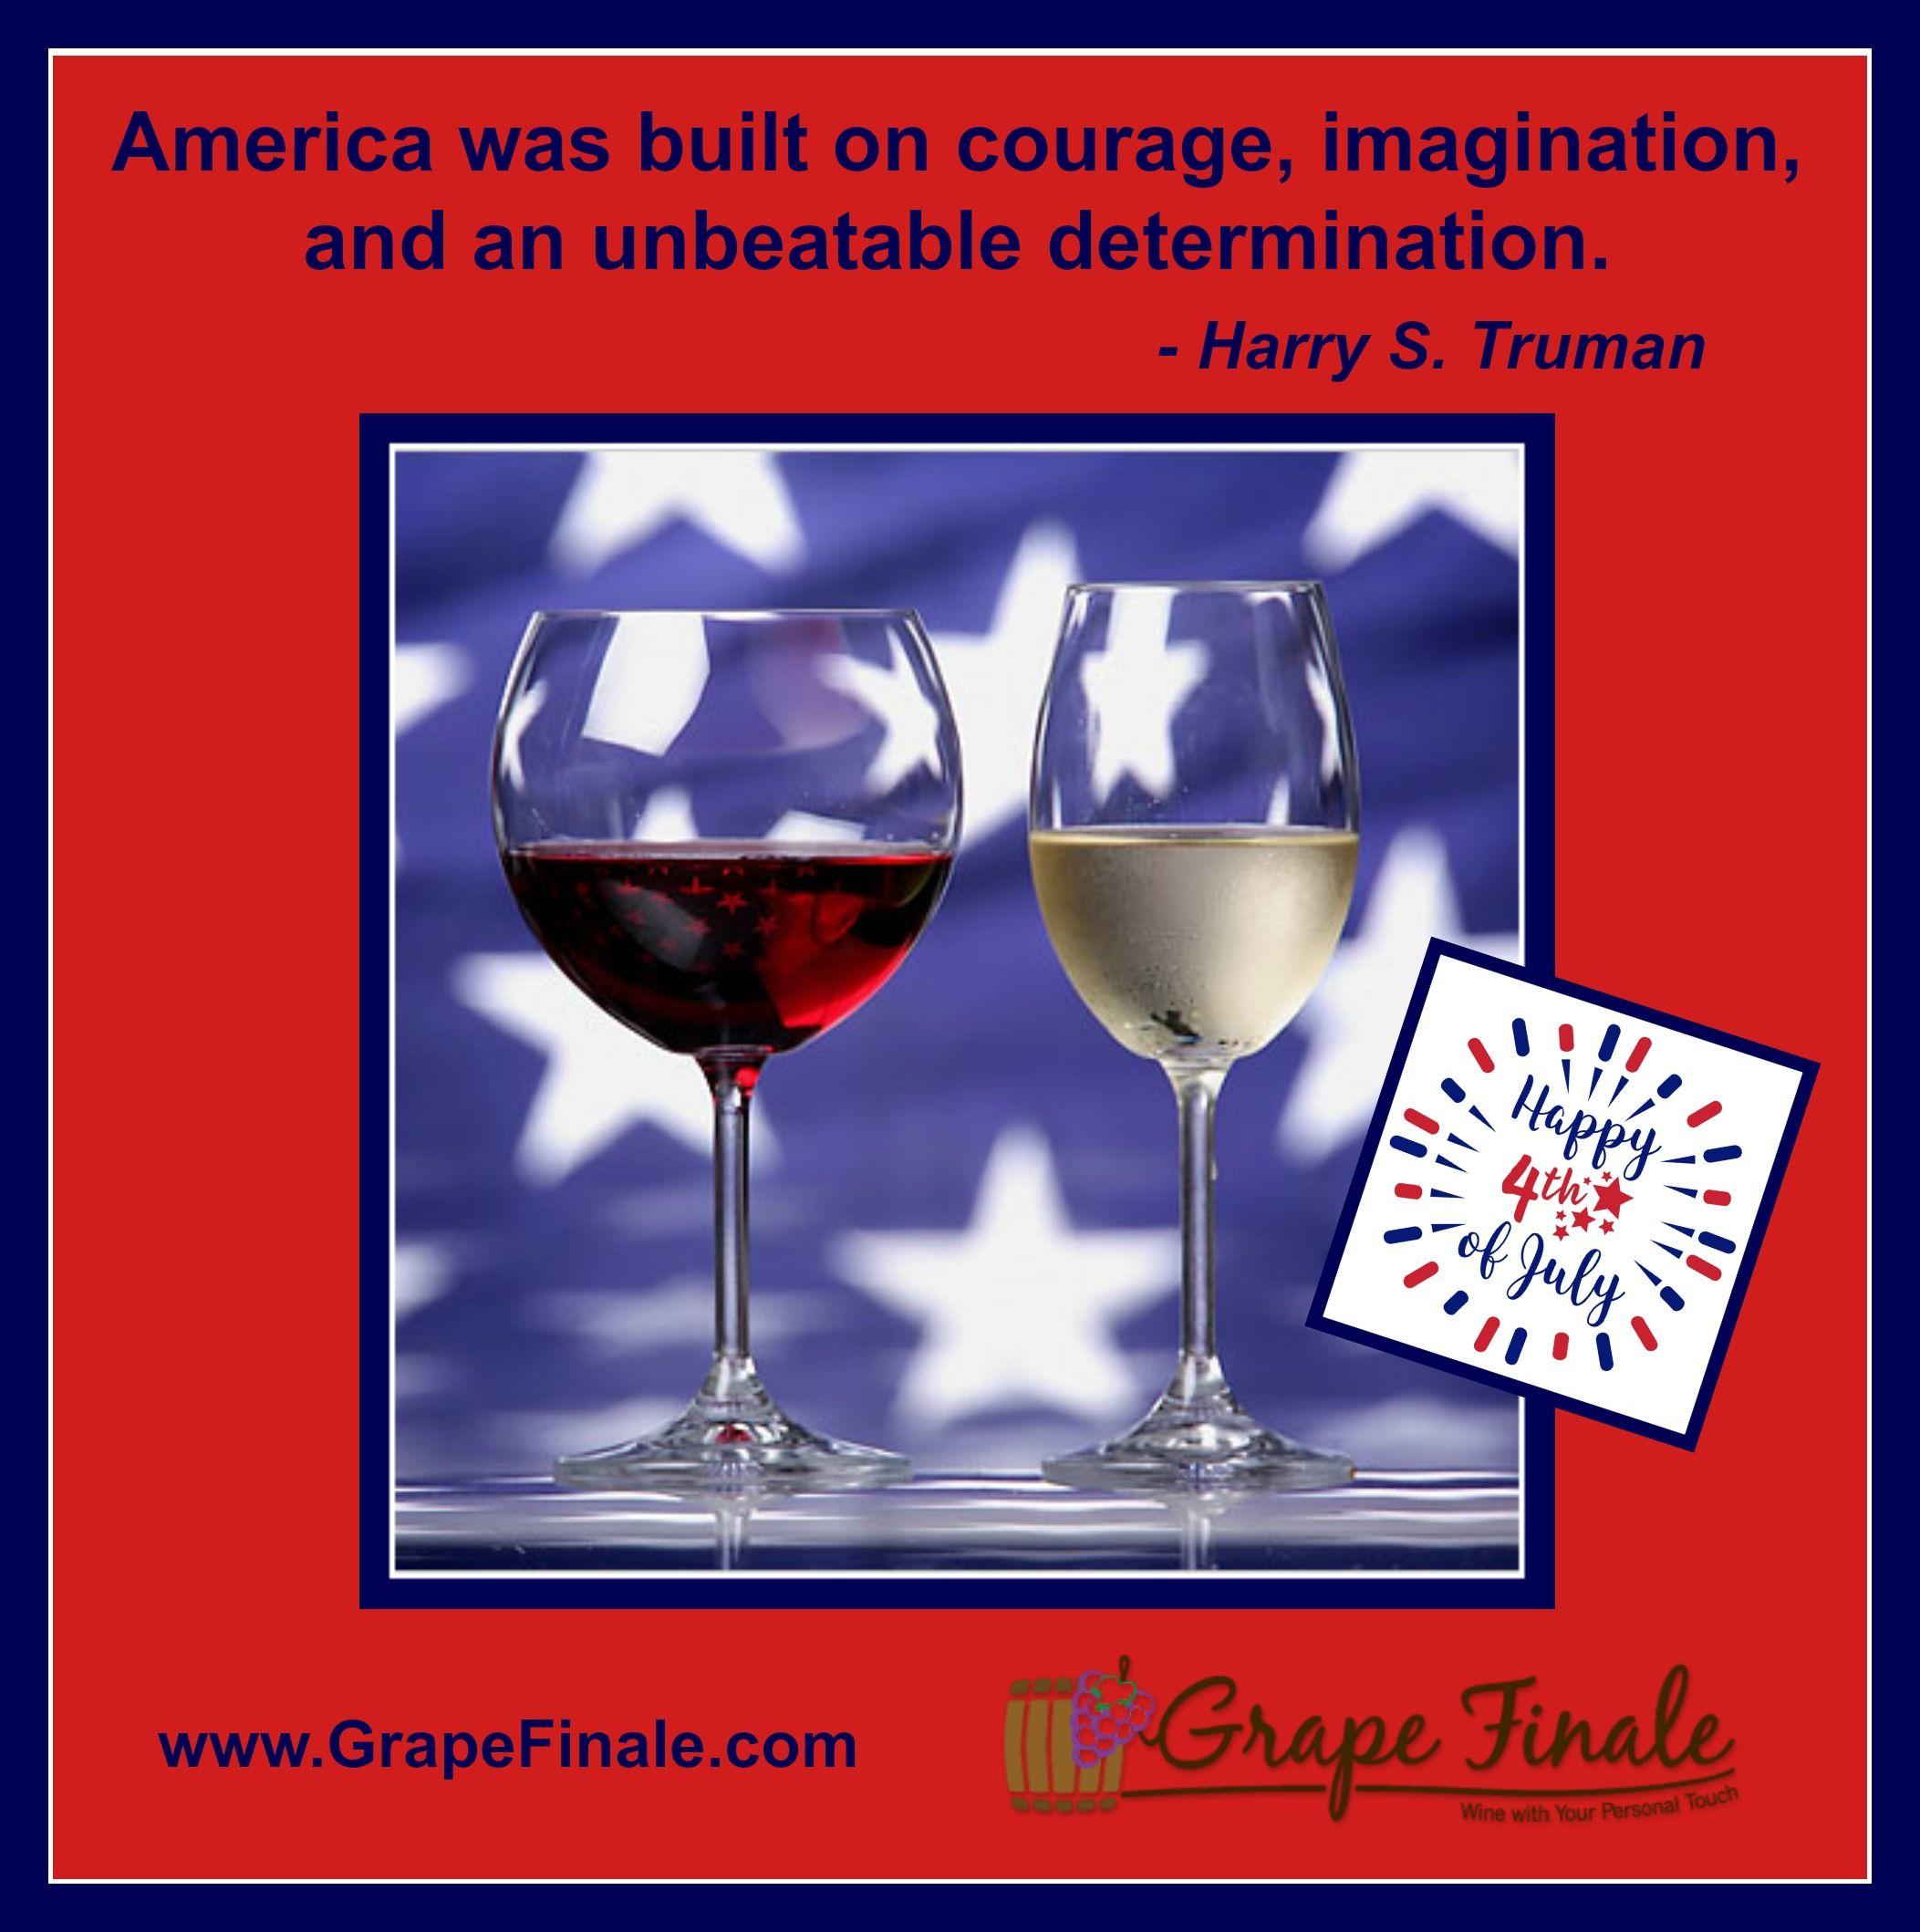 Fourthofjuly America Independenceday Usa 4thofjuly Grapefinale Wine Winemaking Winemaker Makewine Makeyourownwine Winelove Grape Uses Wine Red Wine